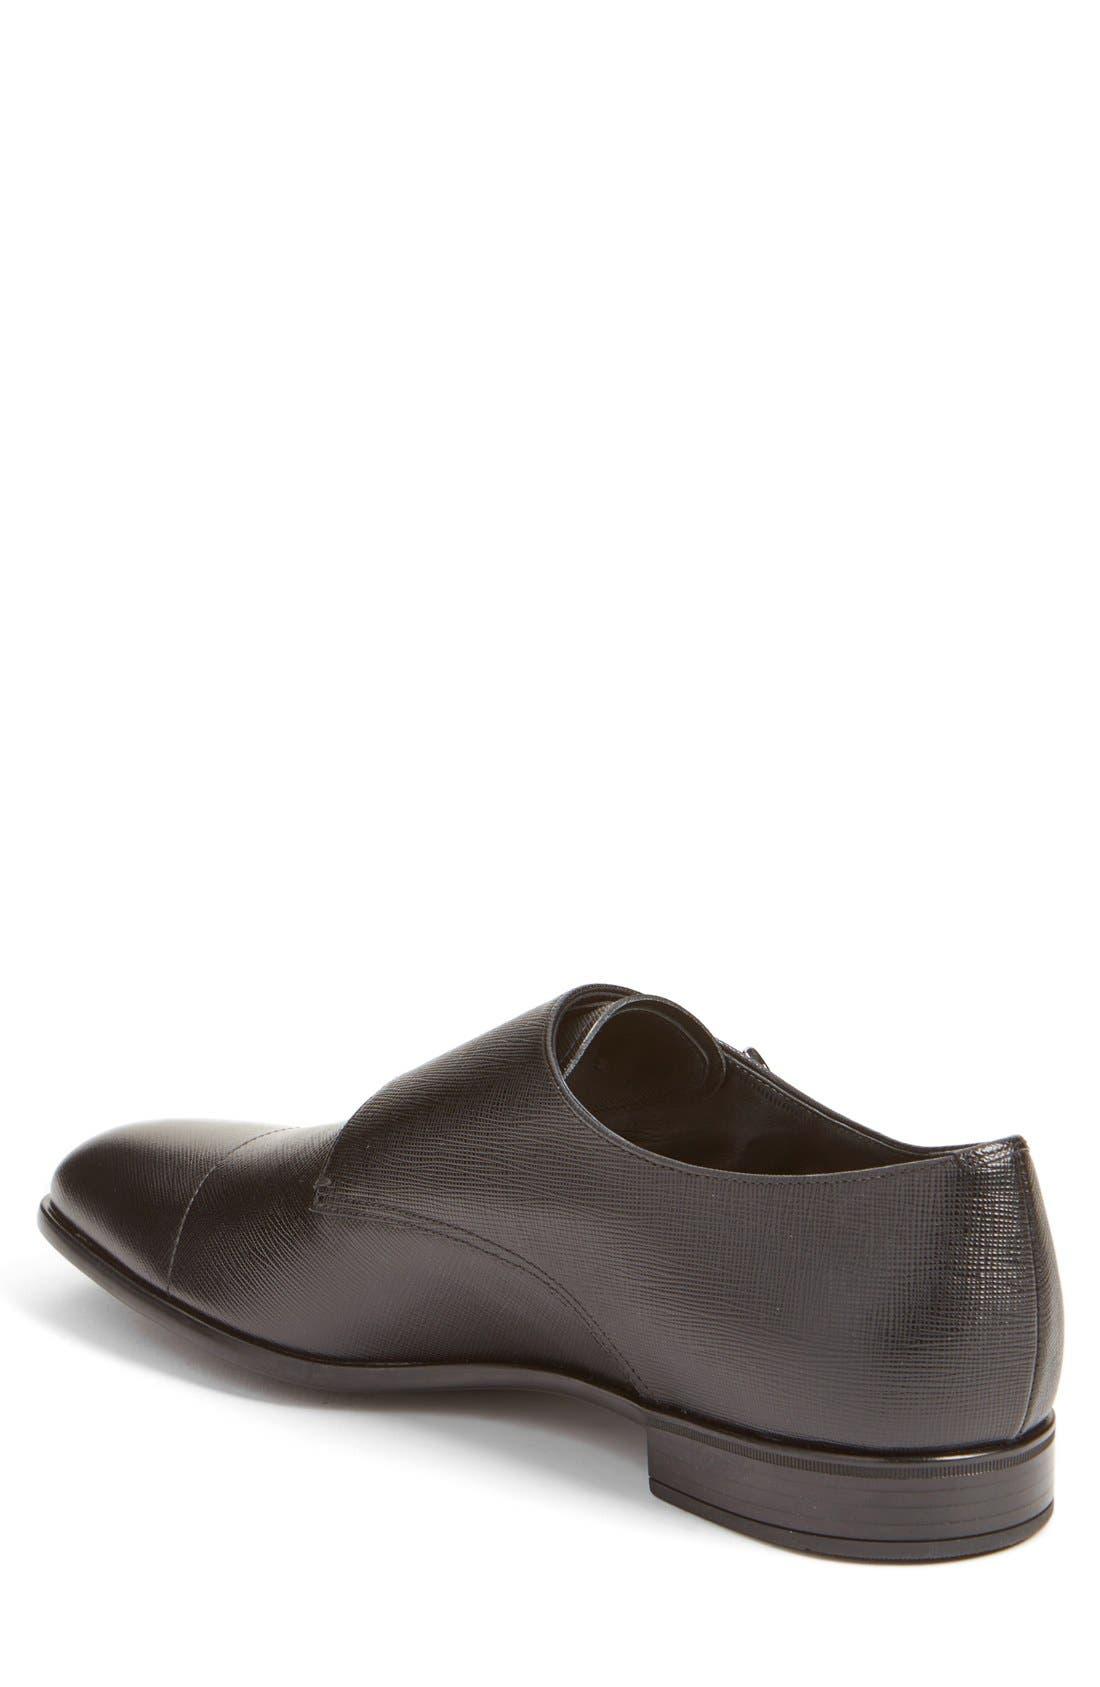 PRADA, Double Monk Strap Shoe, Alternate thumbnail 3, color, NERO LEATHER